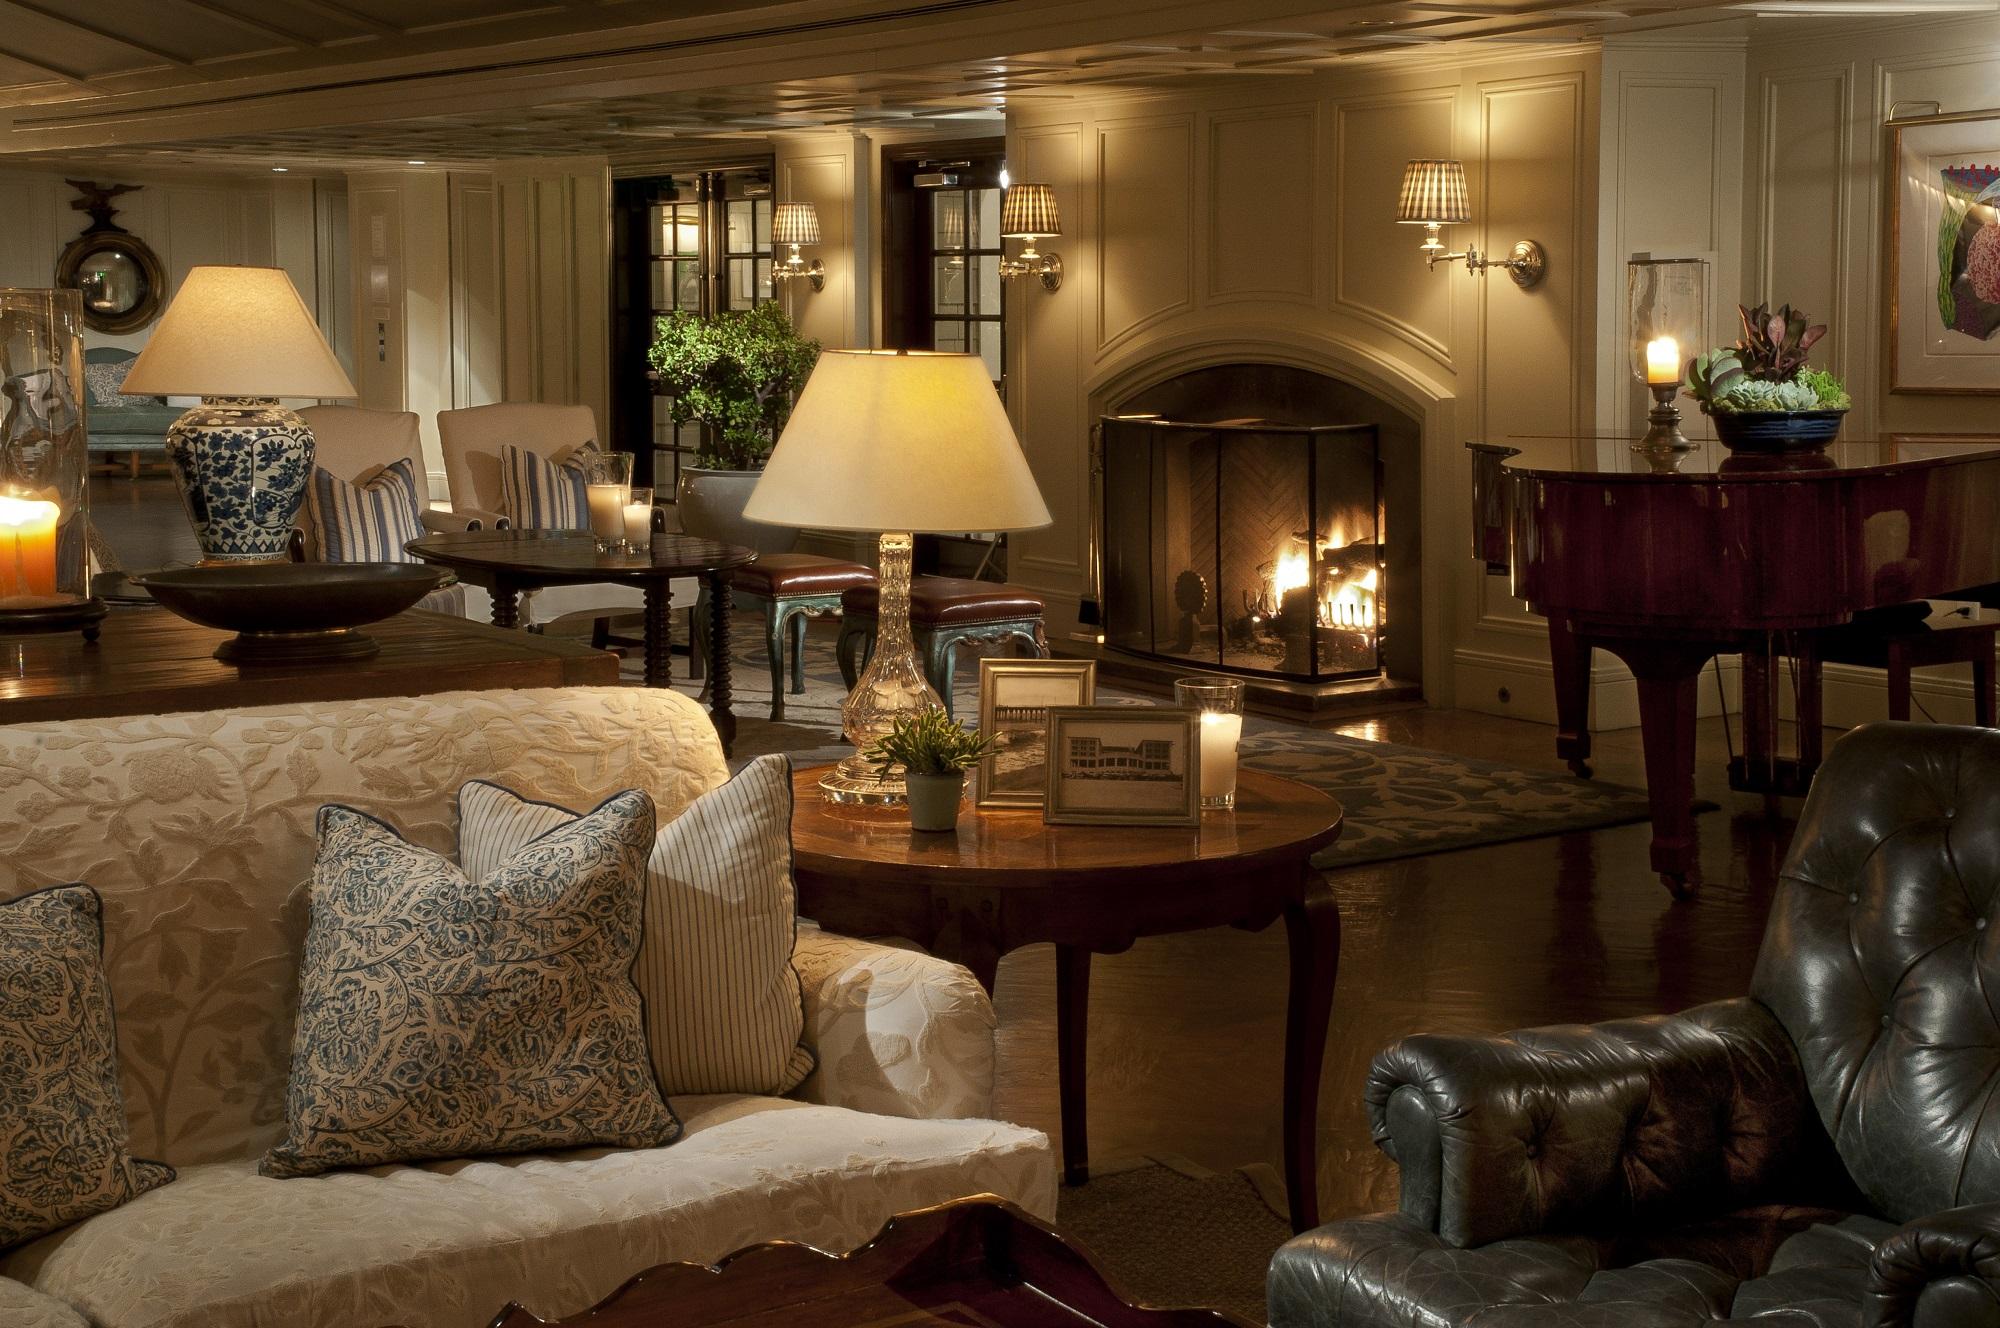 shutters-on-the-beach-santa-monica-lobby-fireplacelo